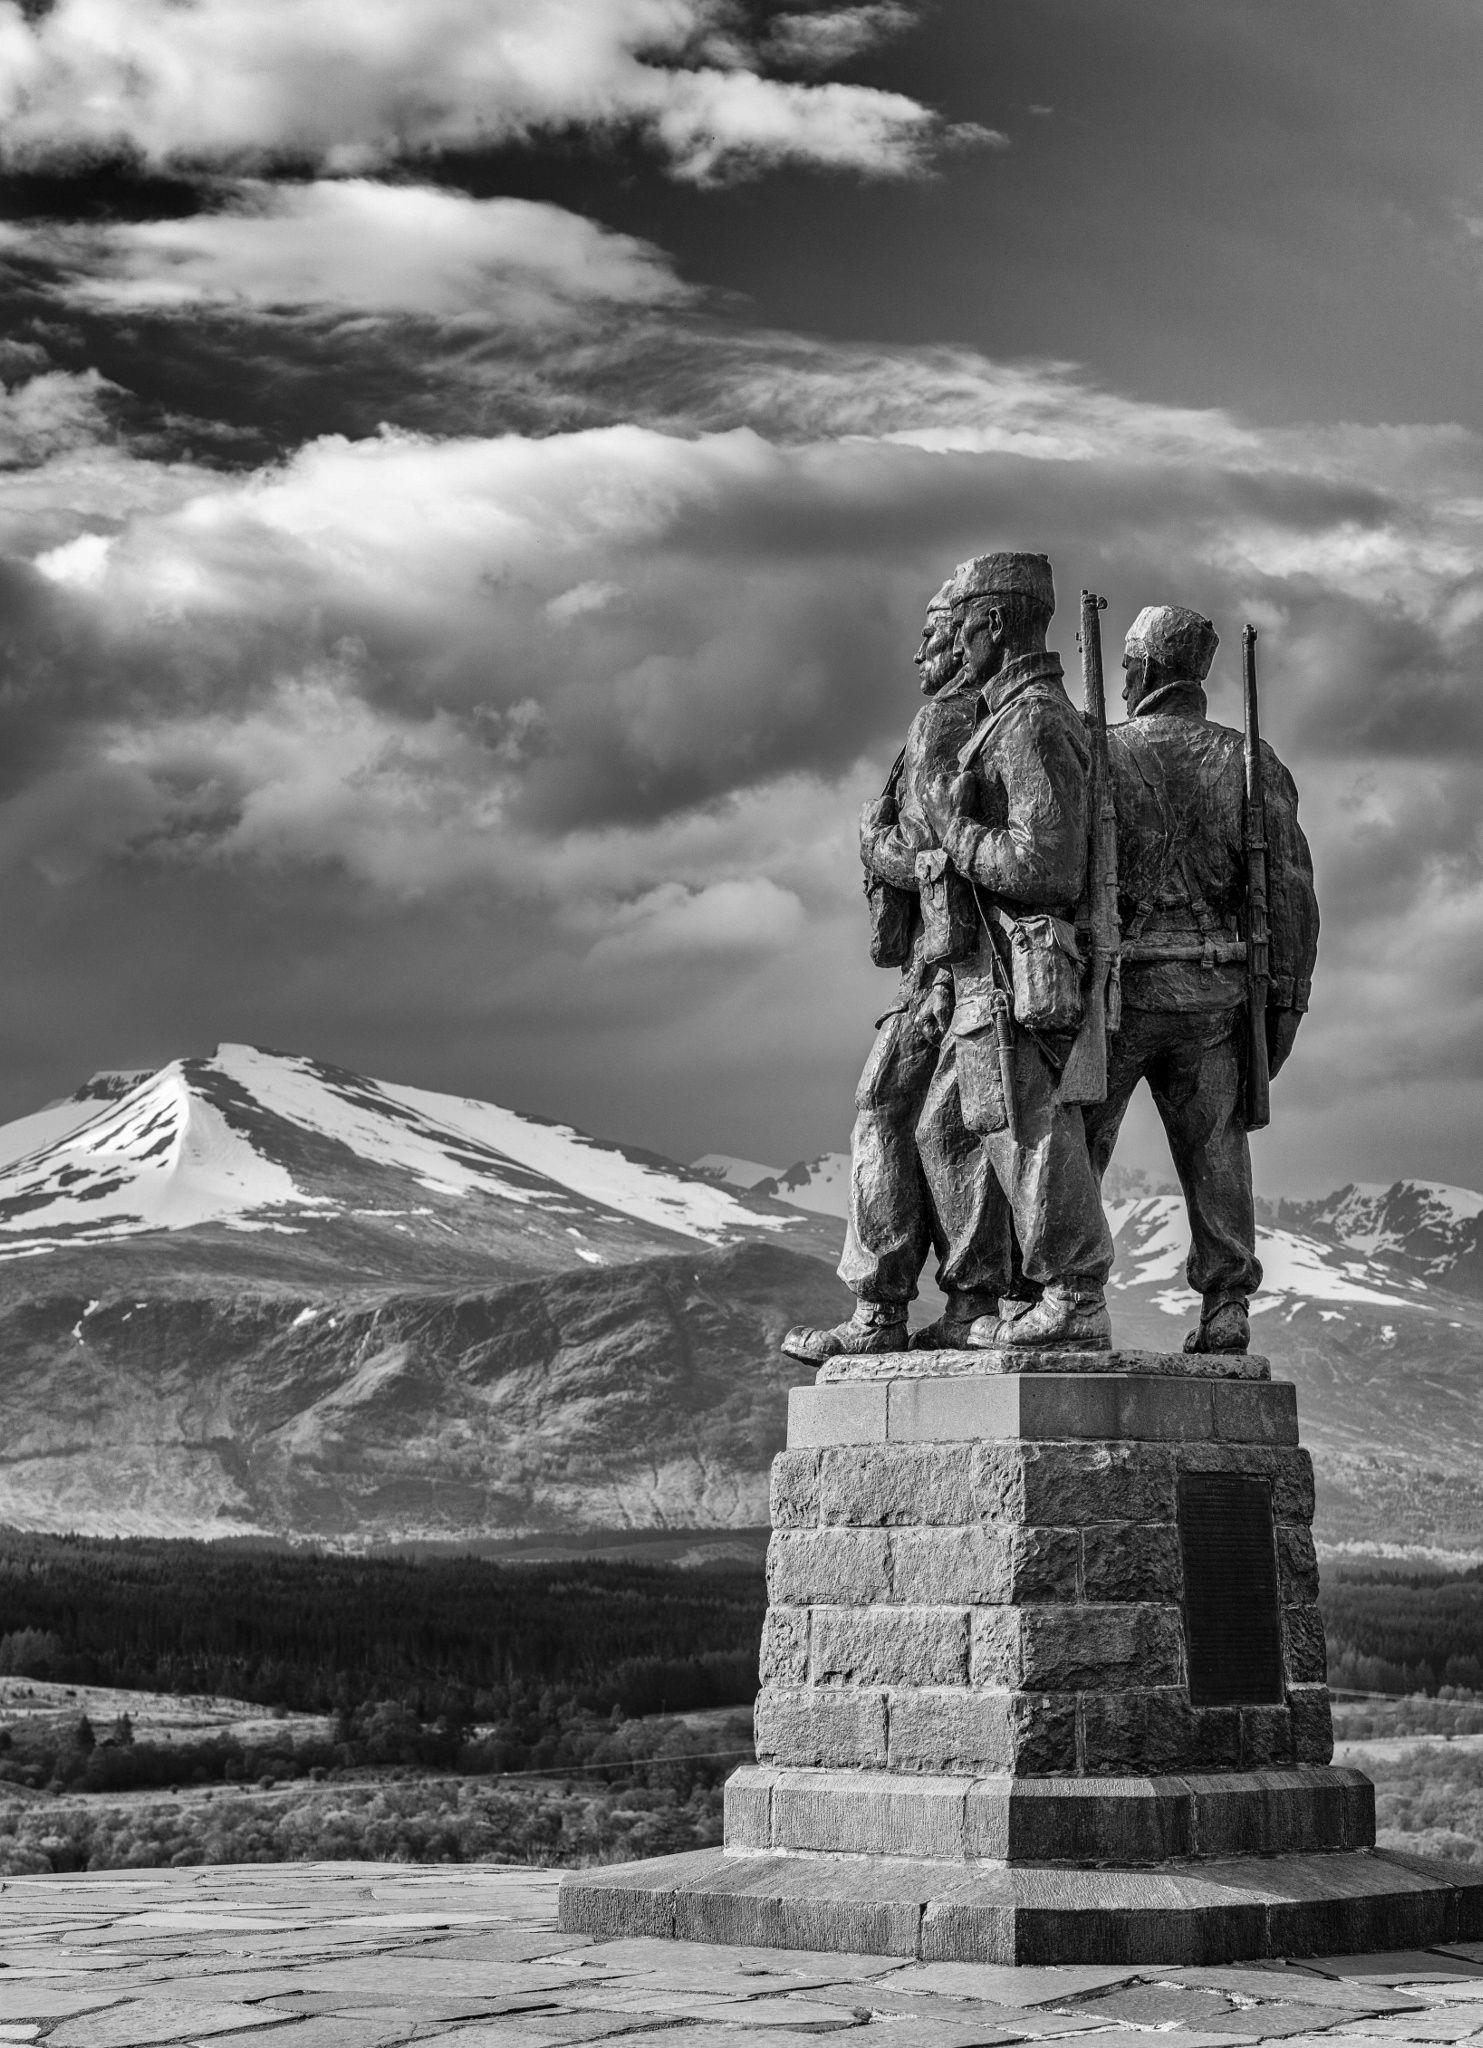 Commando Memorial, Lochaber, Scottish Highlands by Garry Roper.The area around Spean Bridge, was the WW2 training ground for the Commando's.